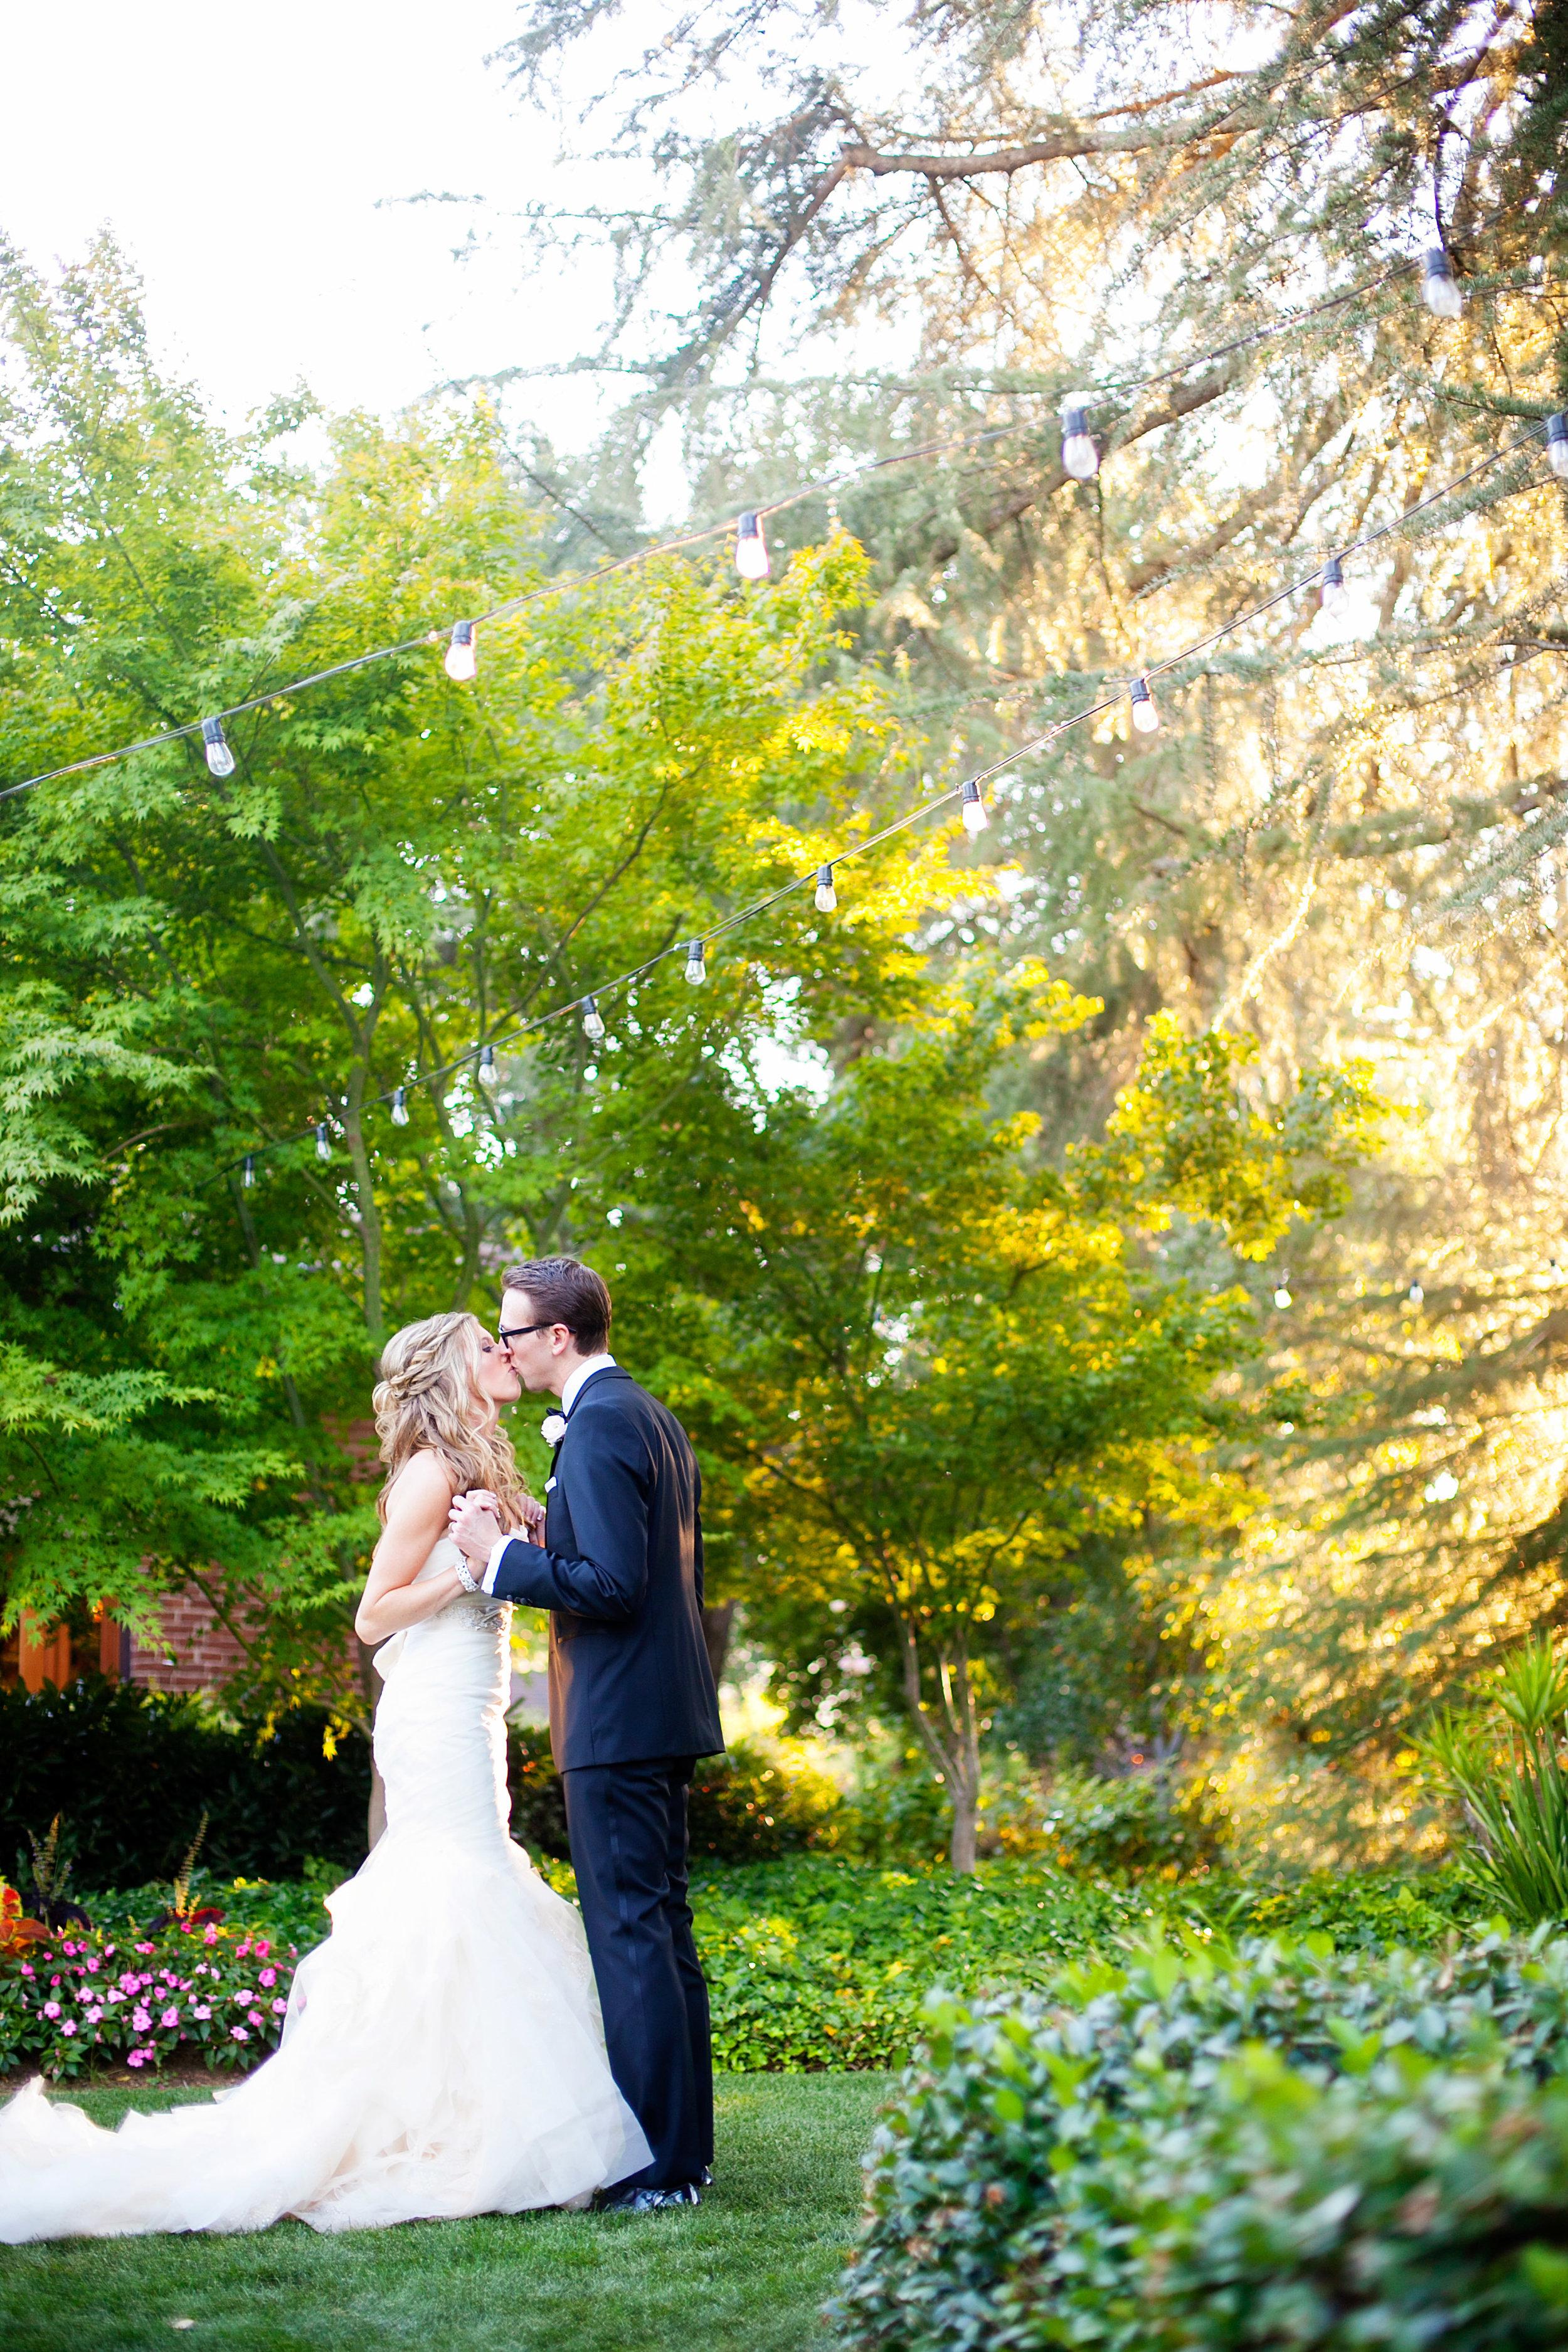 Best-Napa-Valley-Wedding-Venues-Vintage-Estates-Yountville.jpg